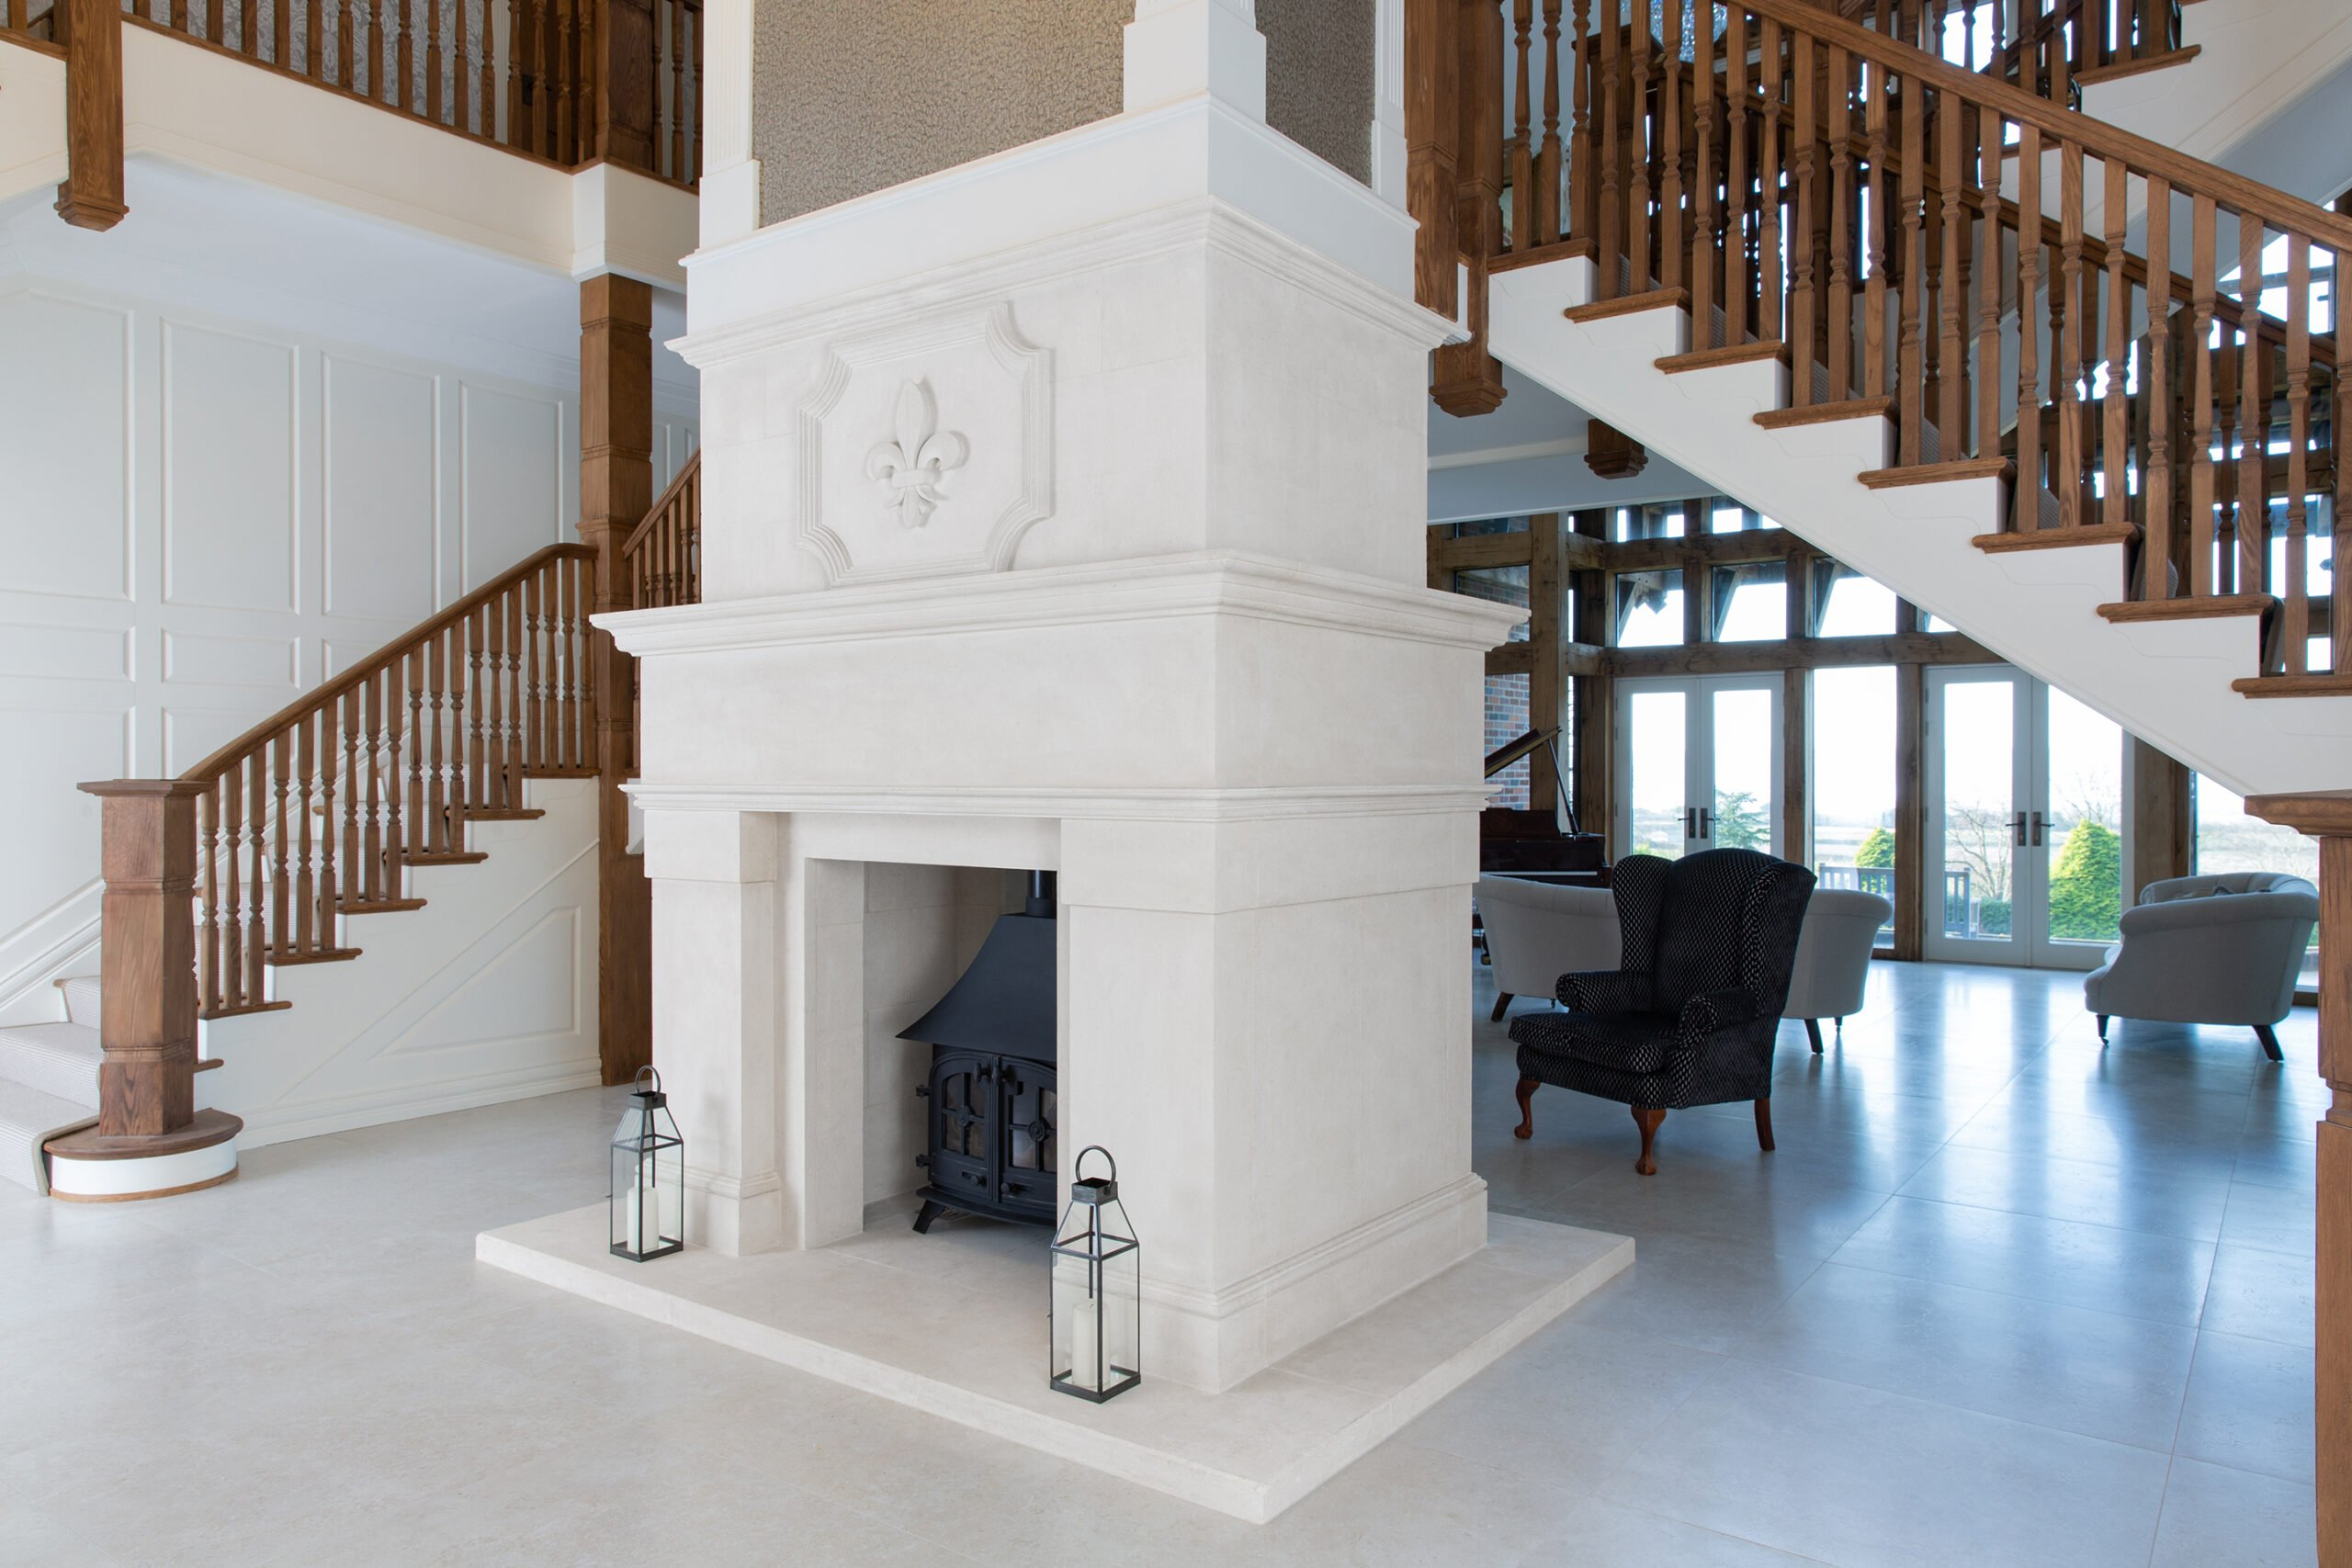 Grand feature fireplace between two staircases, Sandridge Stone Fireplaces, Limestone, Bath Stone, Portland Limestone, Melksham, Wiltshire